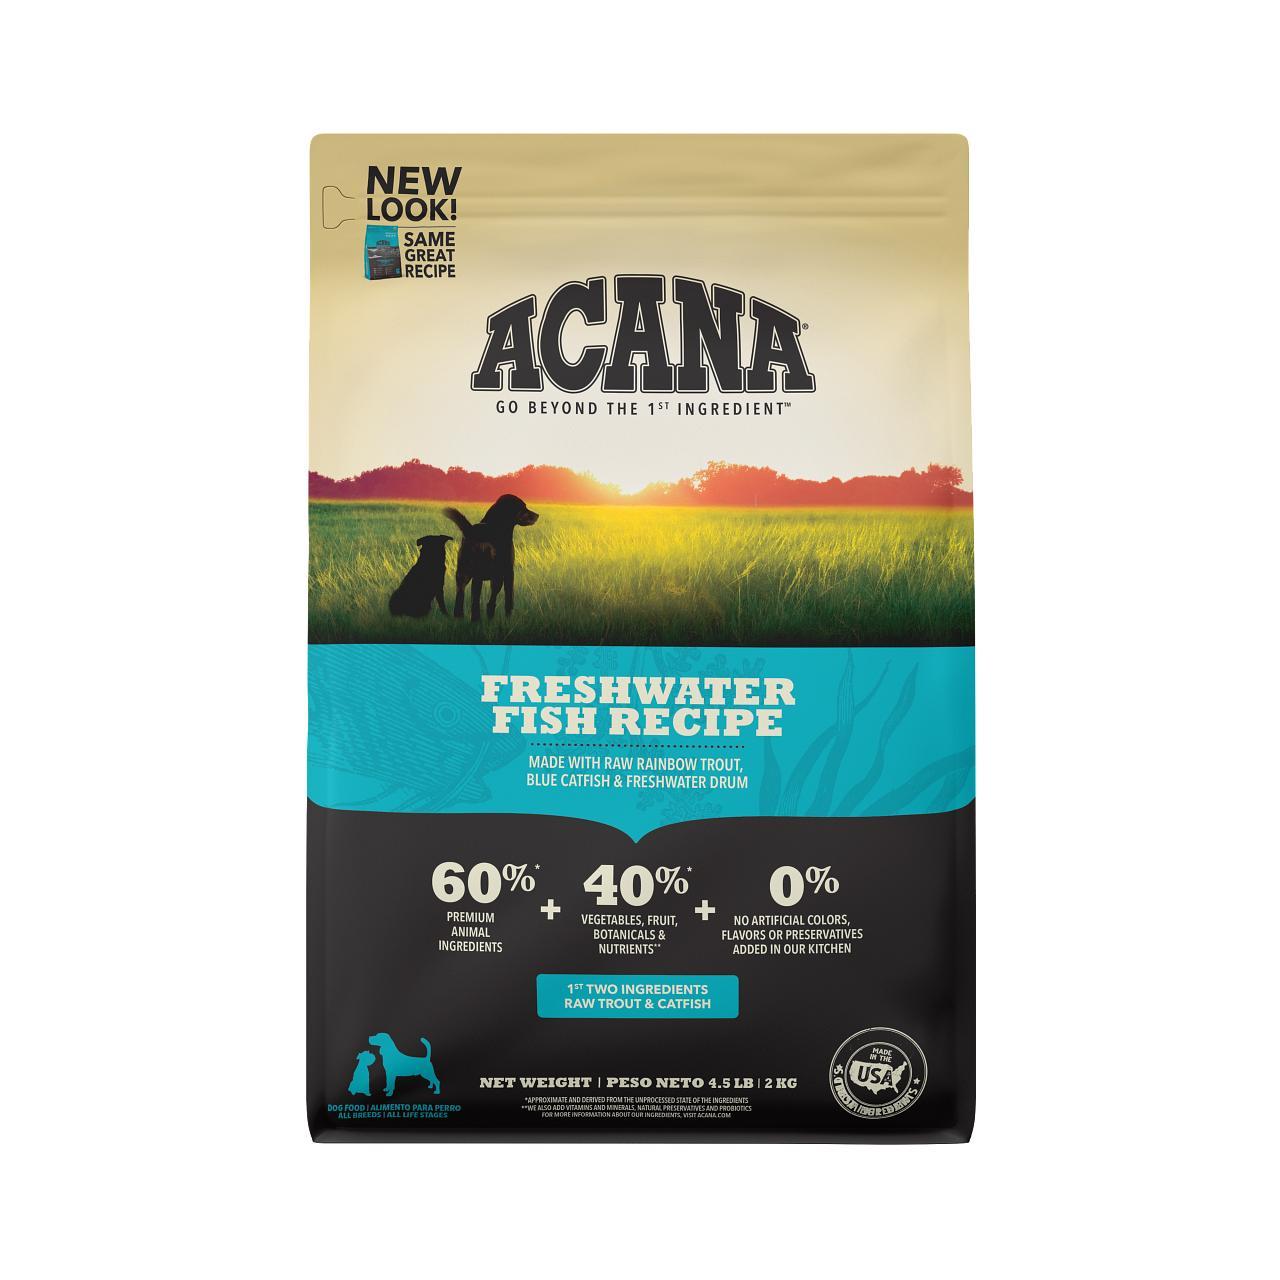 ACANA Freshwater Fish Grain-Free Dry Dog Food, 4.5-lb